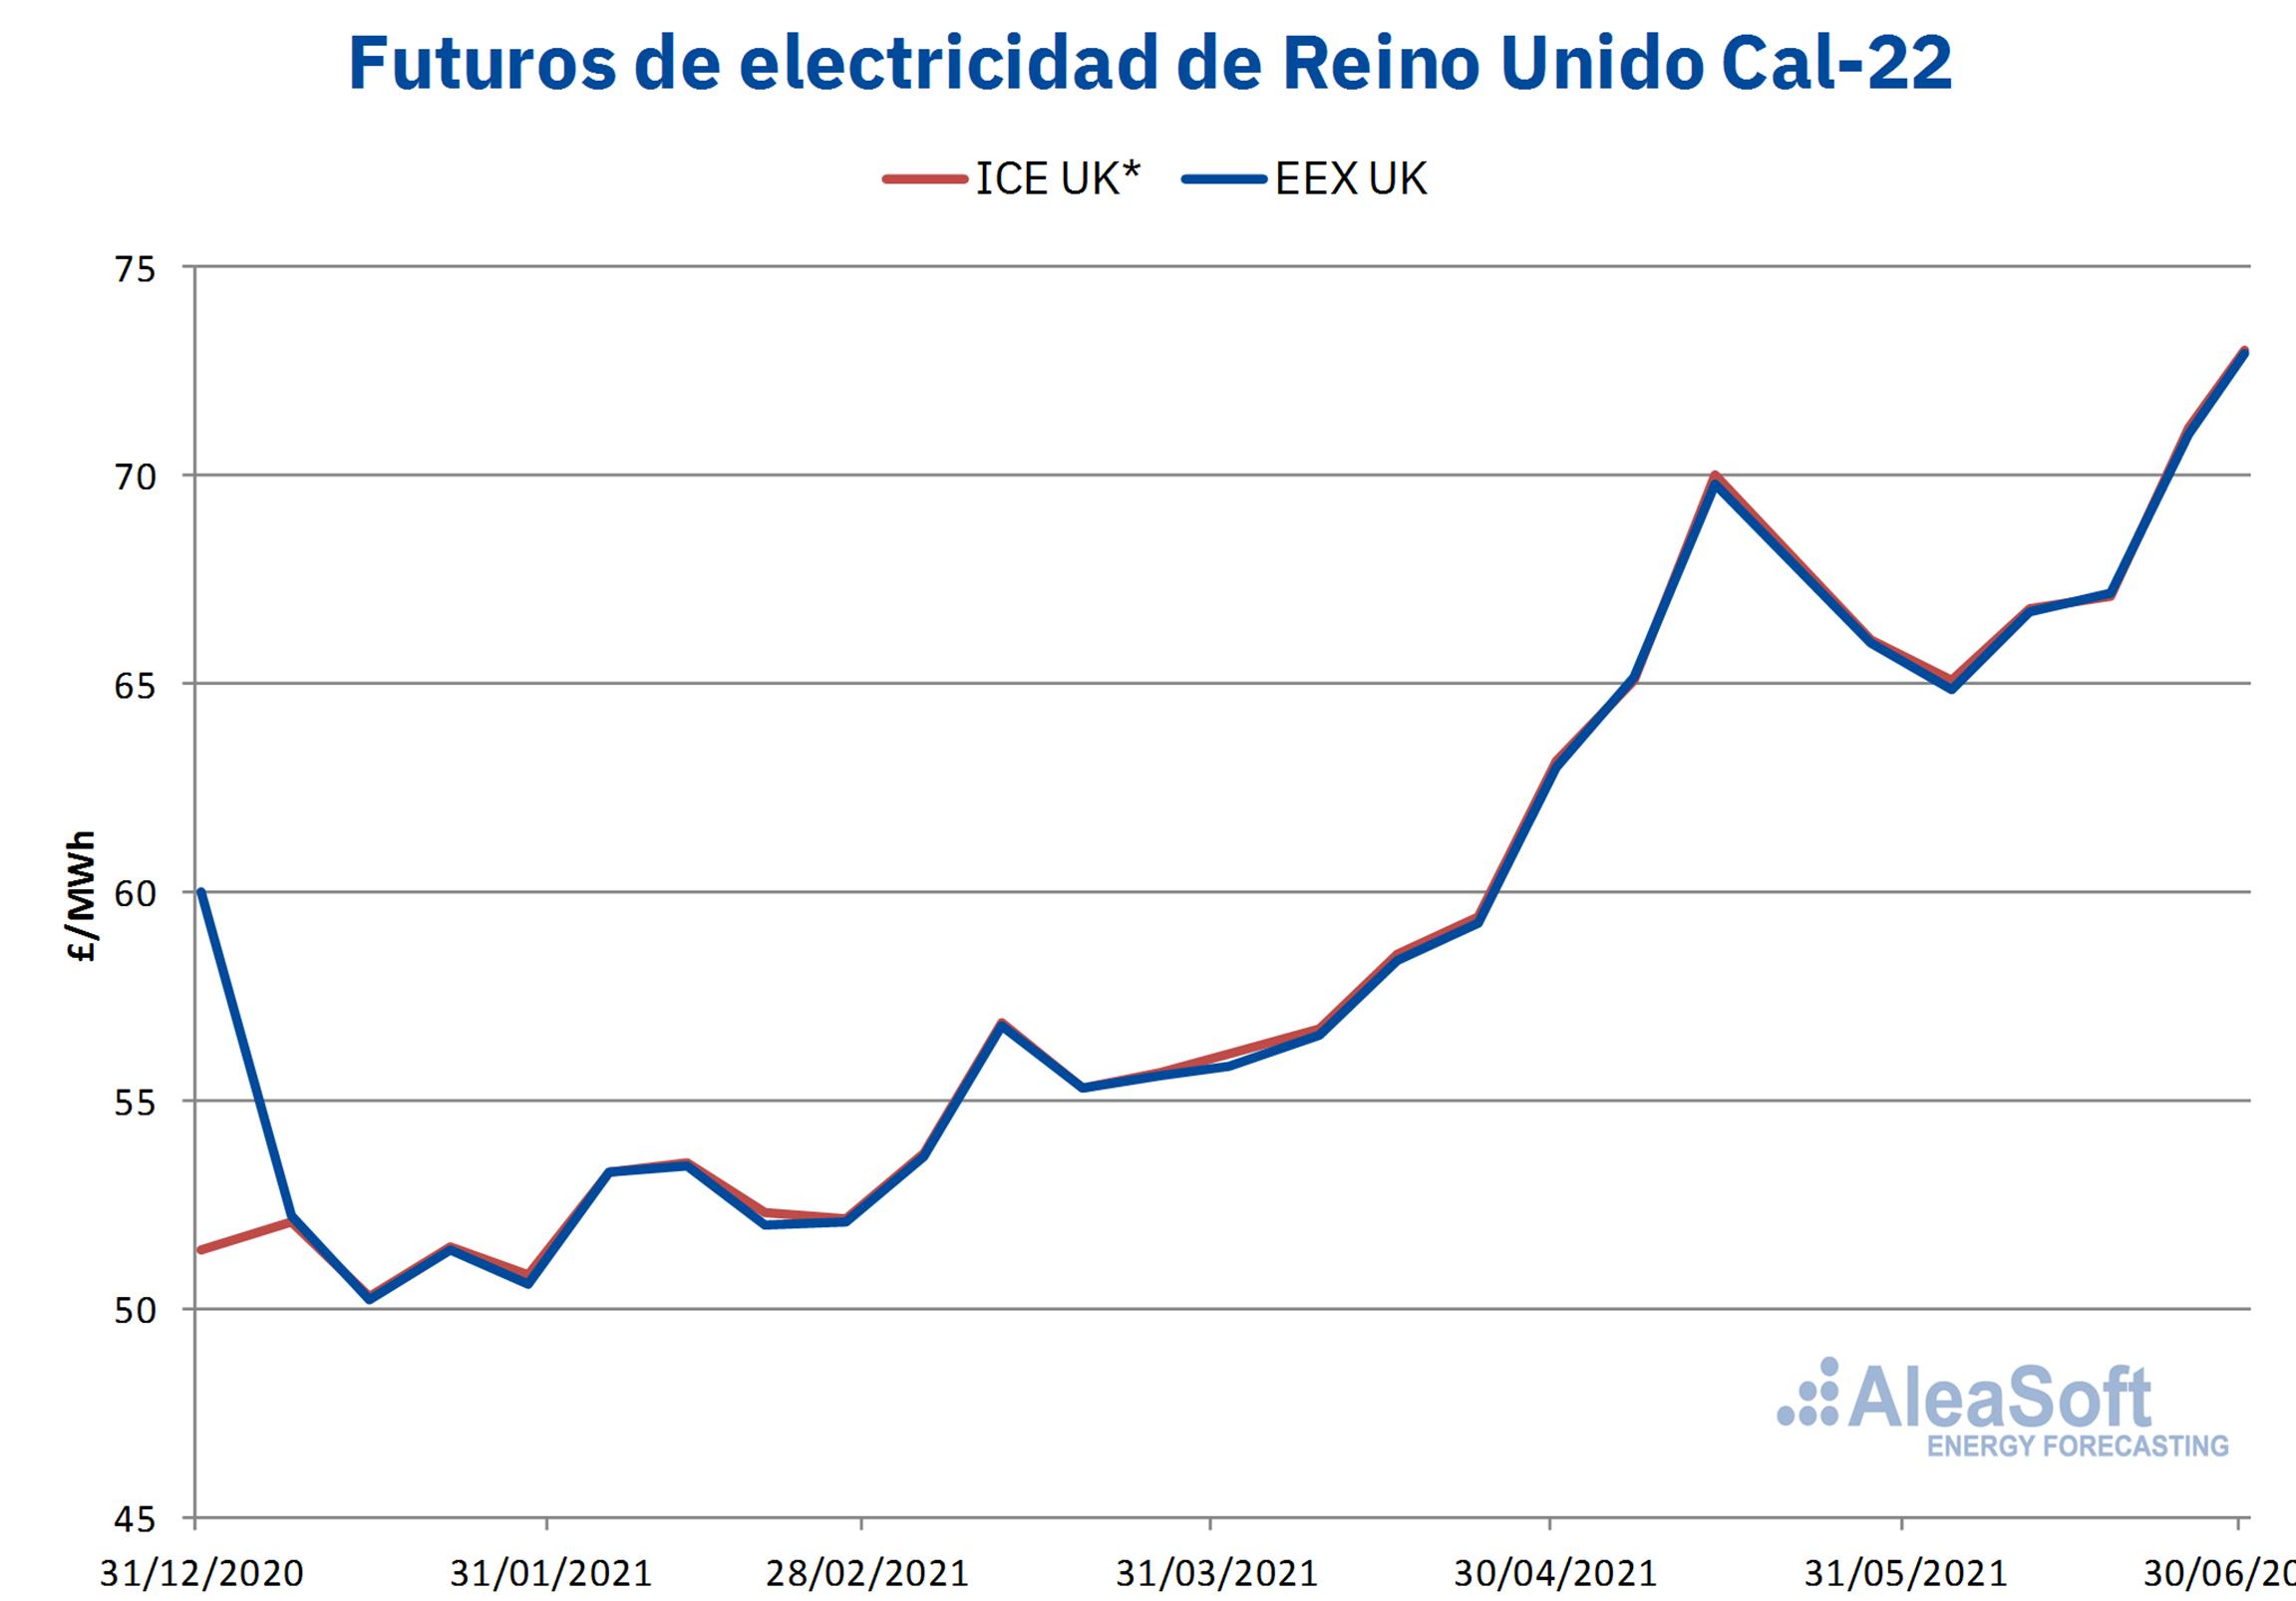 AleaSoft - Precios futuros electriciad cal 22 uk